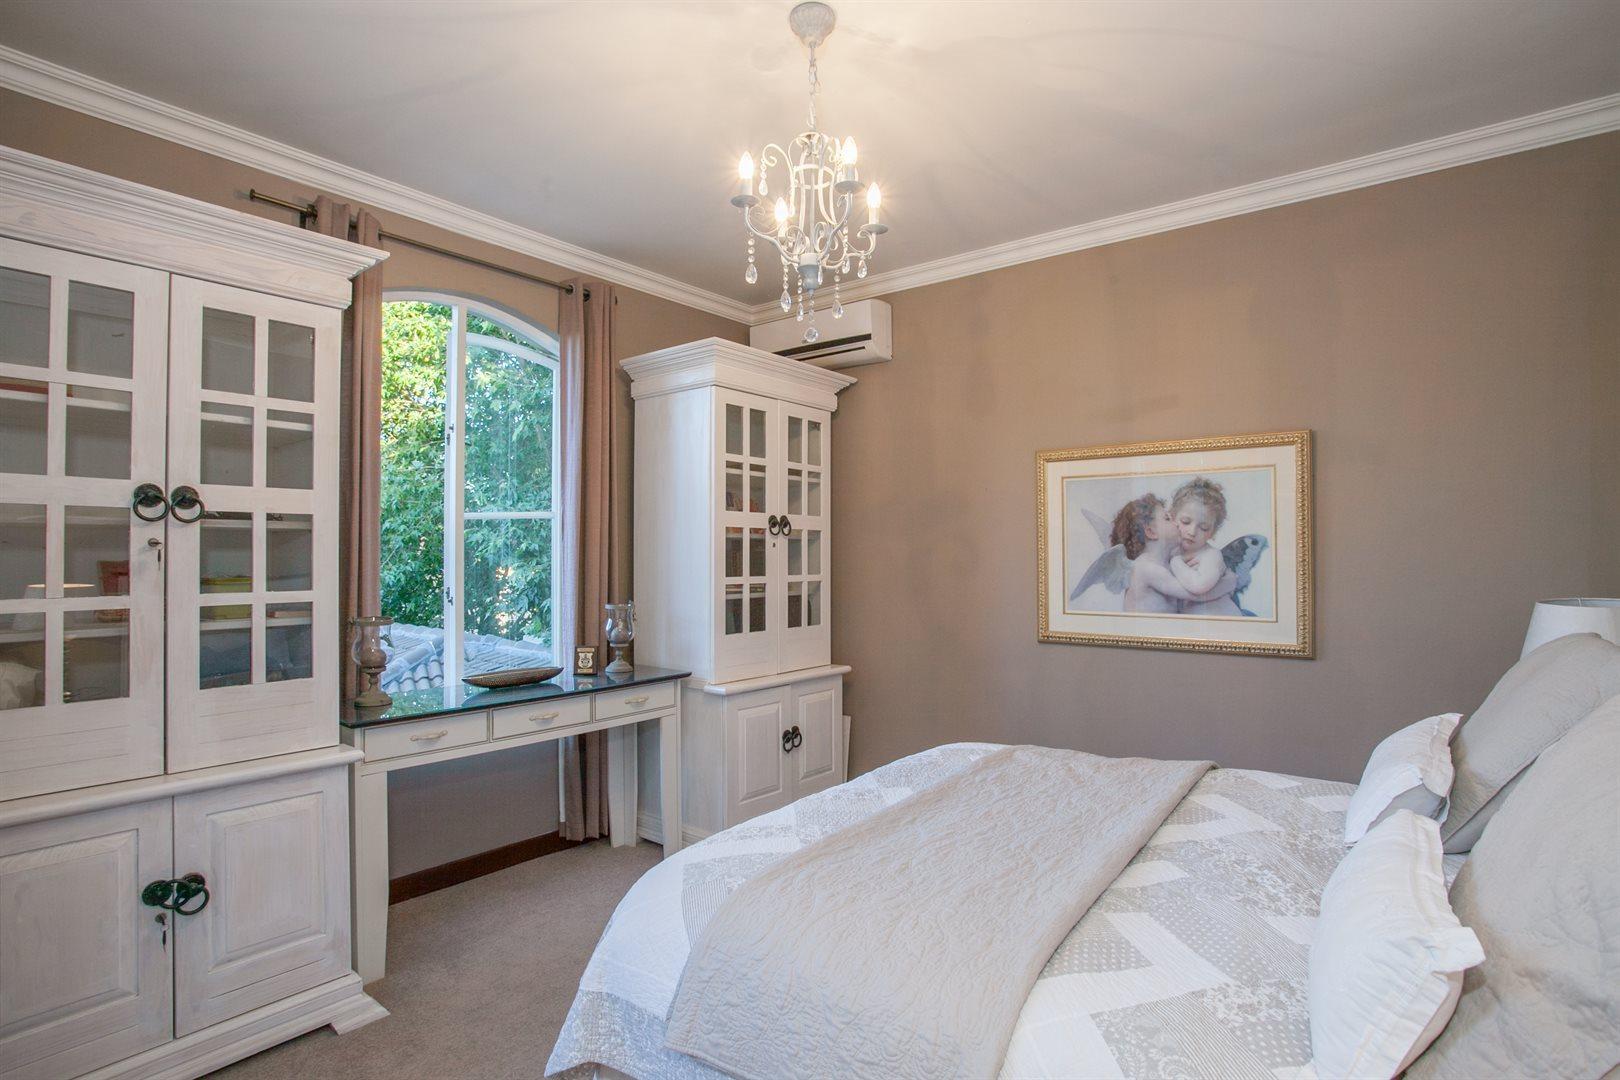 Fernbrook Estate property for sale. Ref No: 13543900. Picture no 9